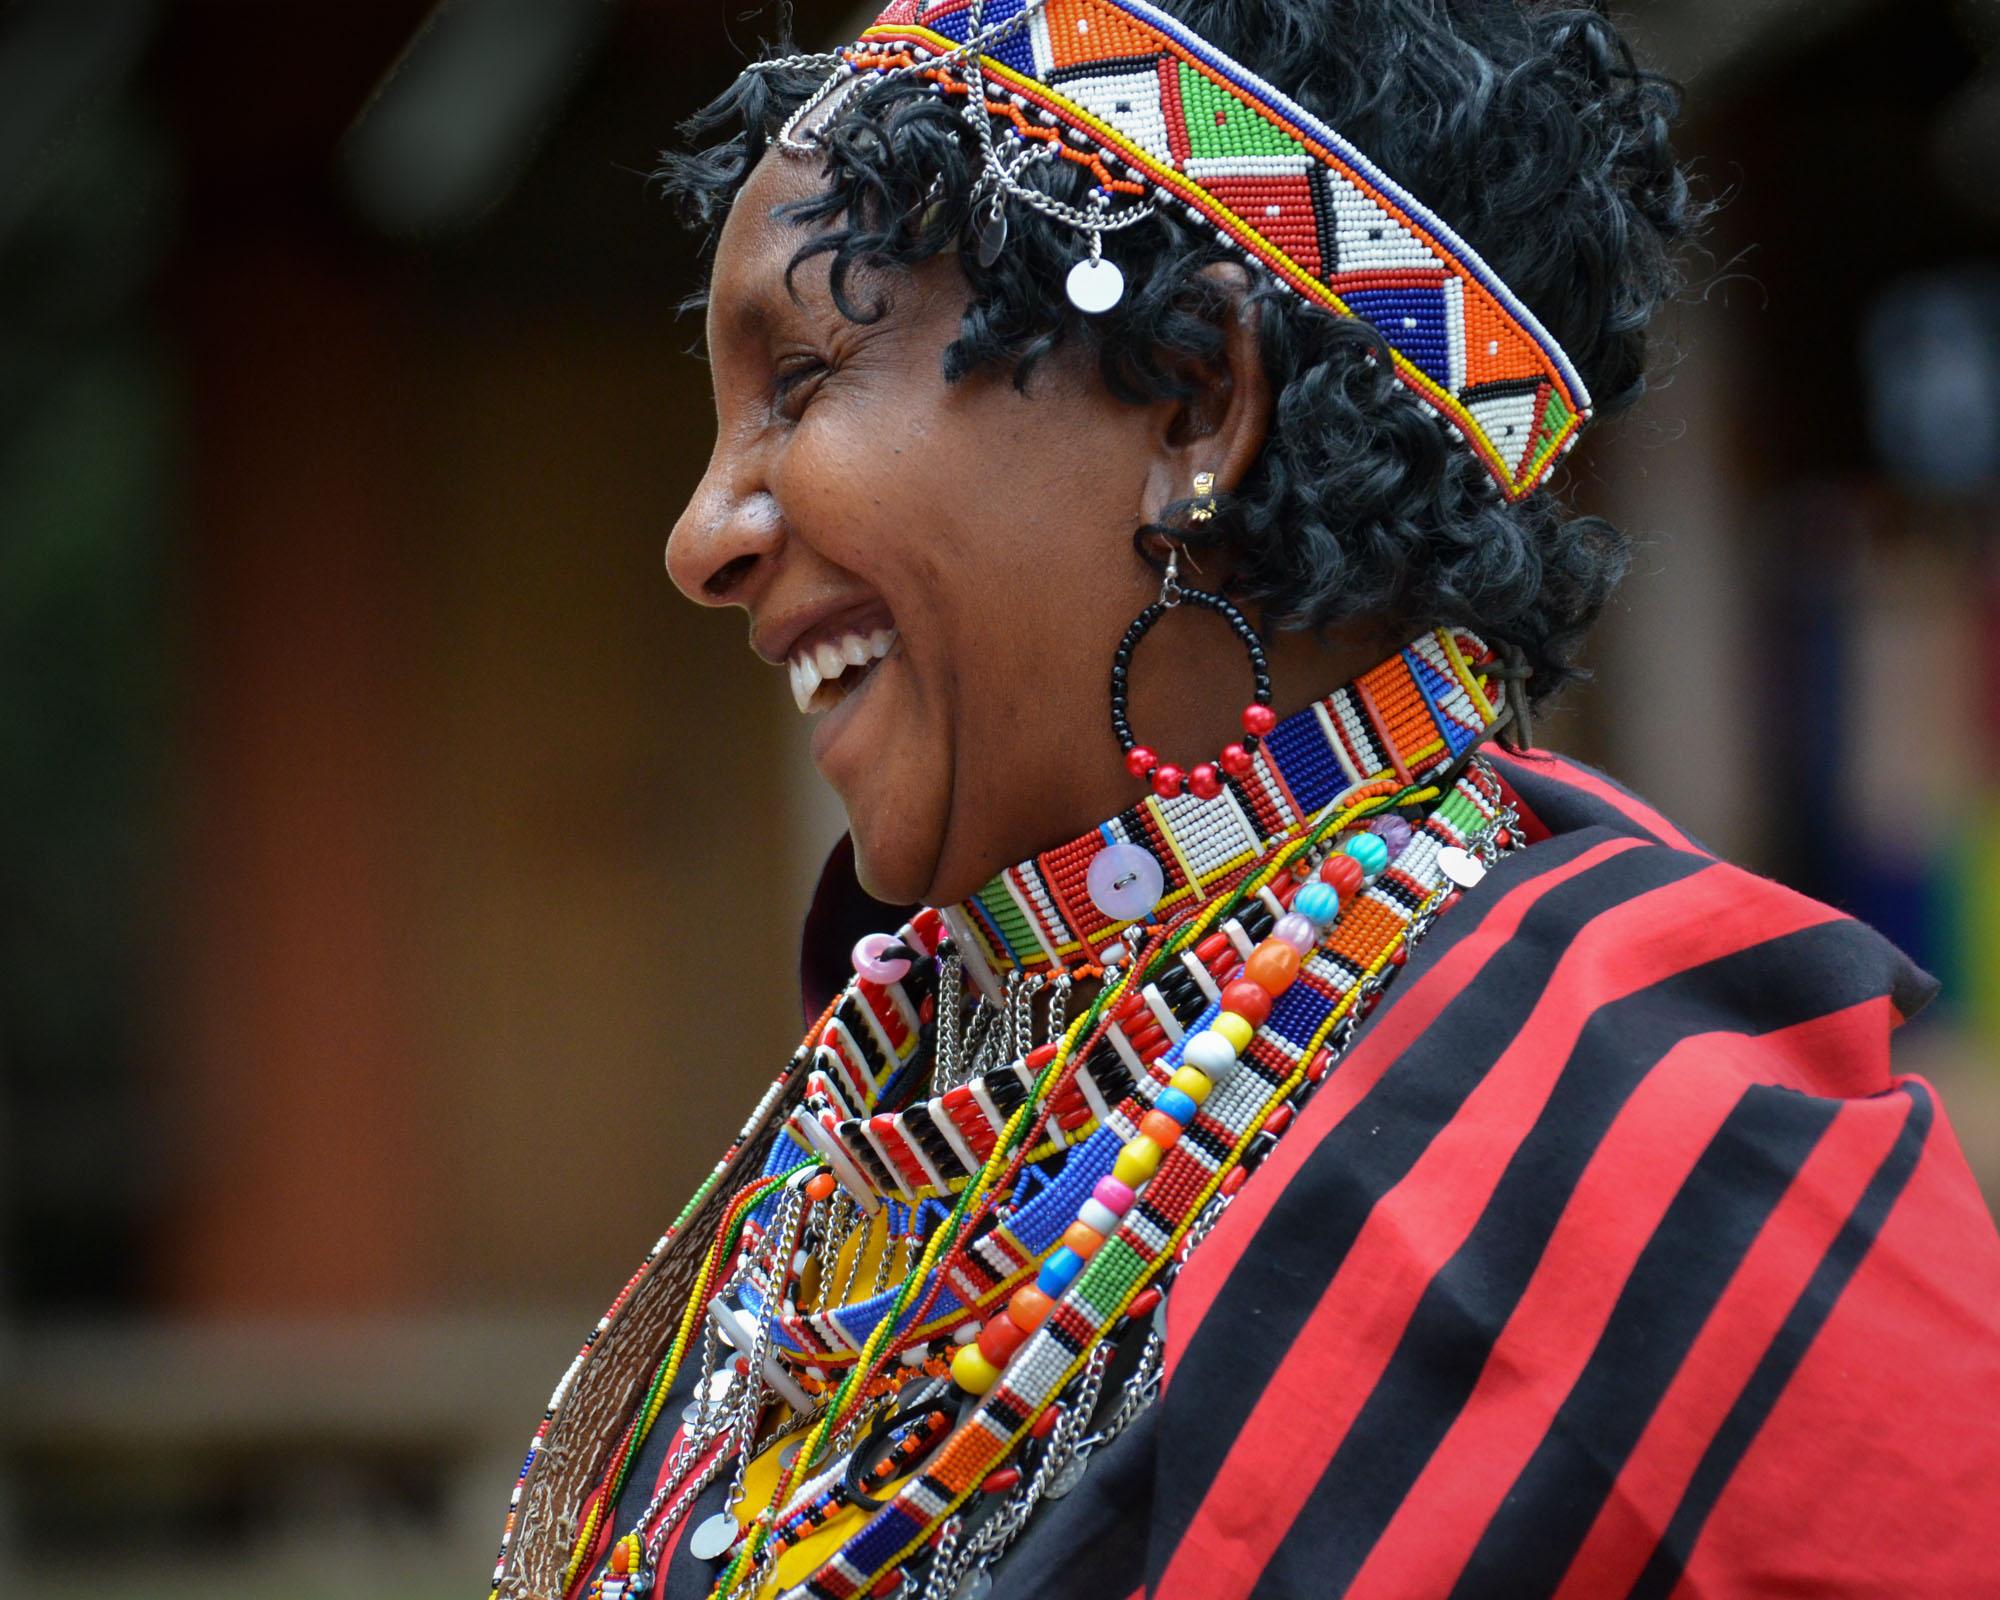 mama-maasai-we-kenya-portrait-kenya-2011-10-22.jpg